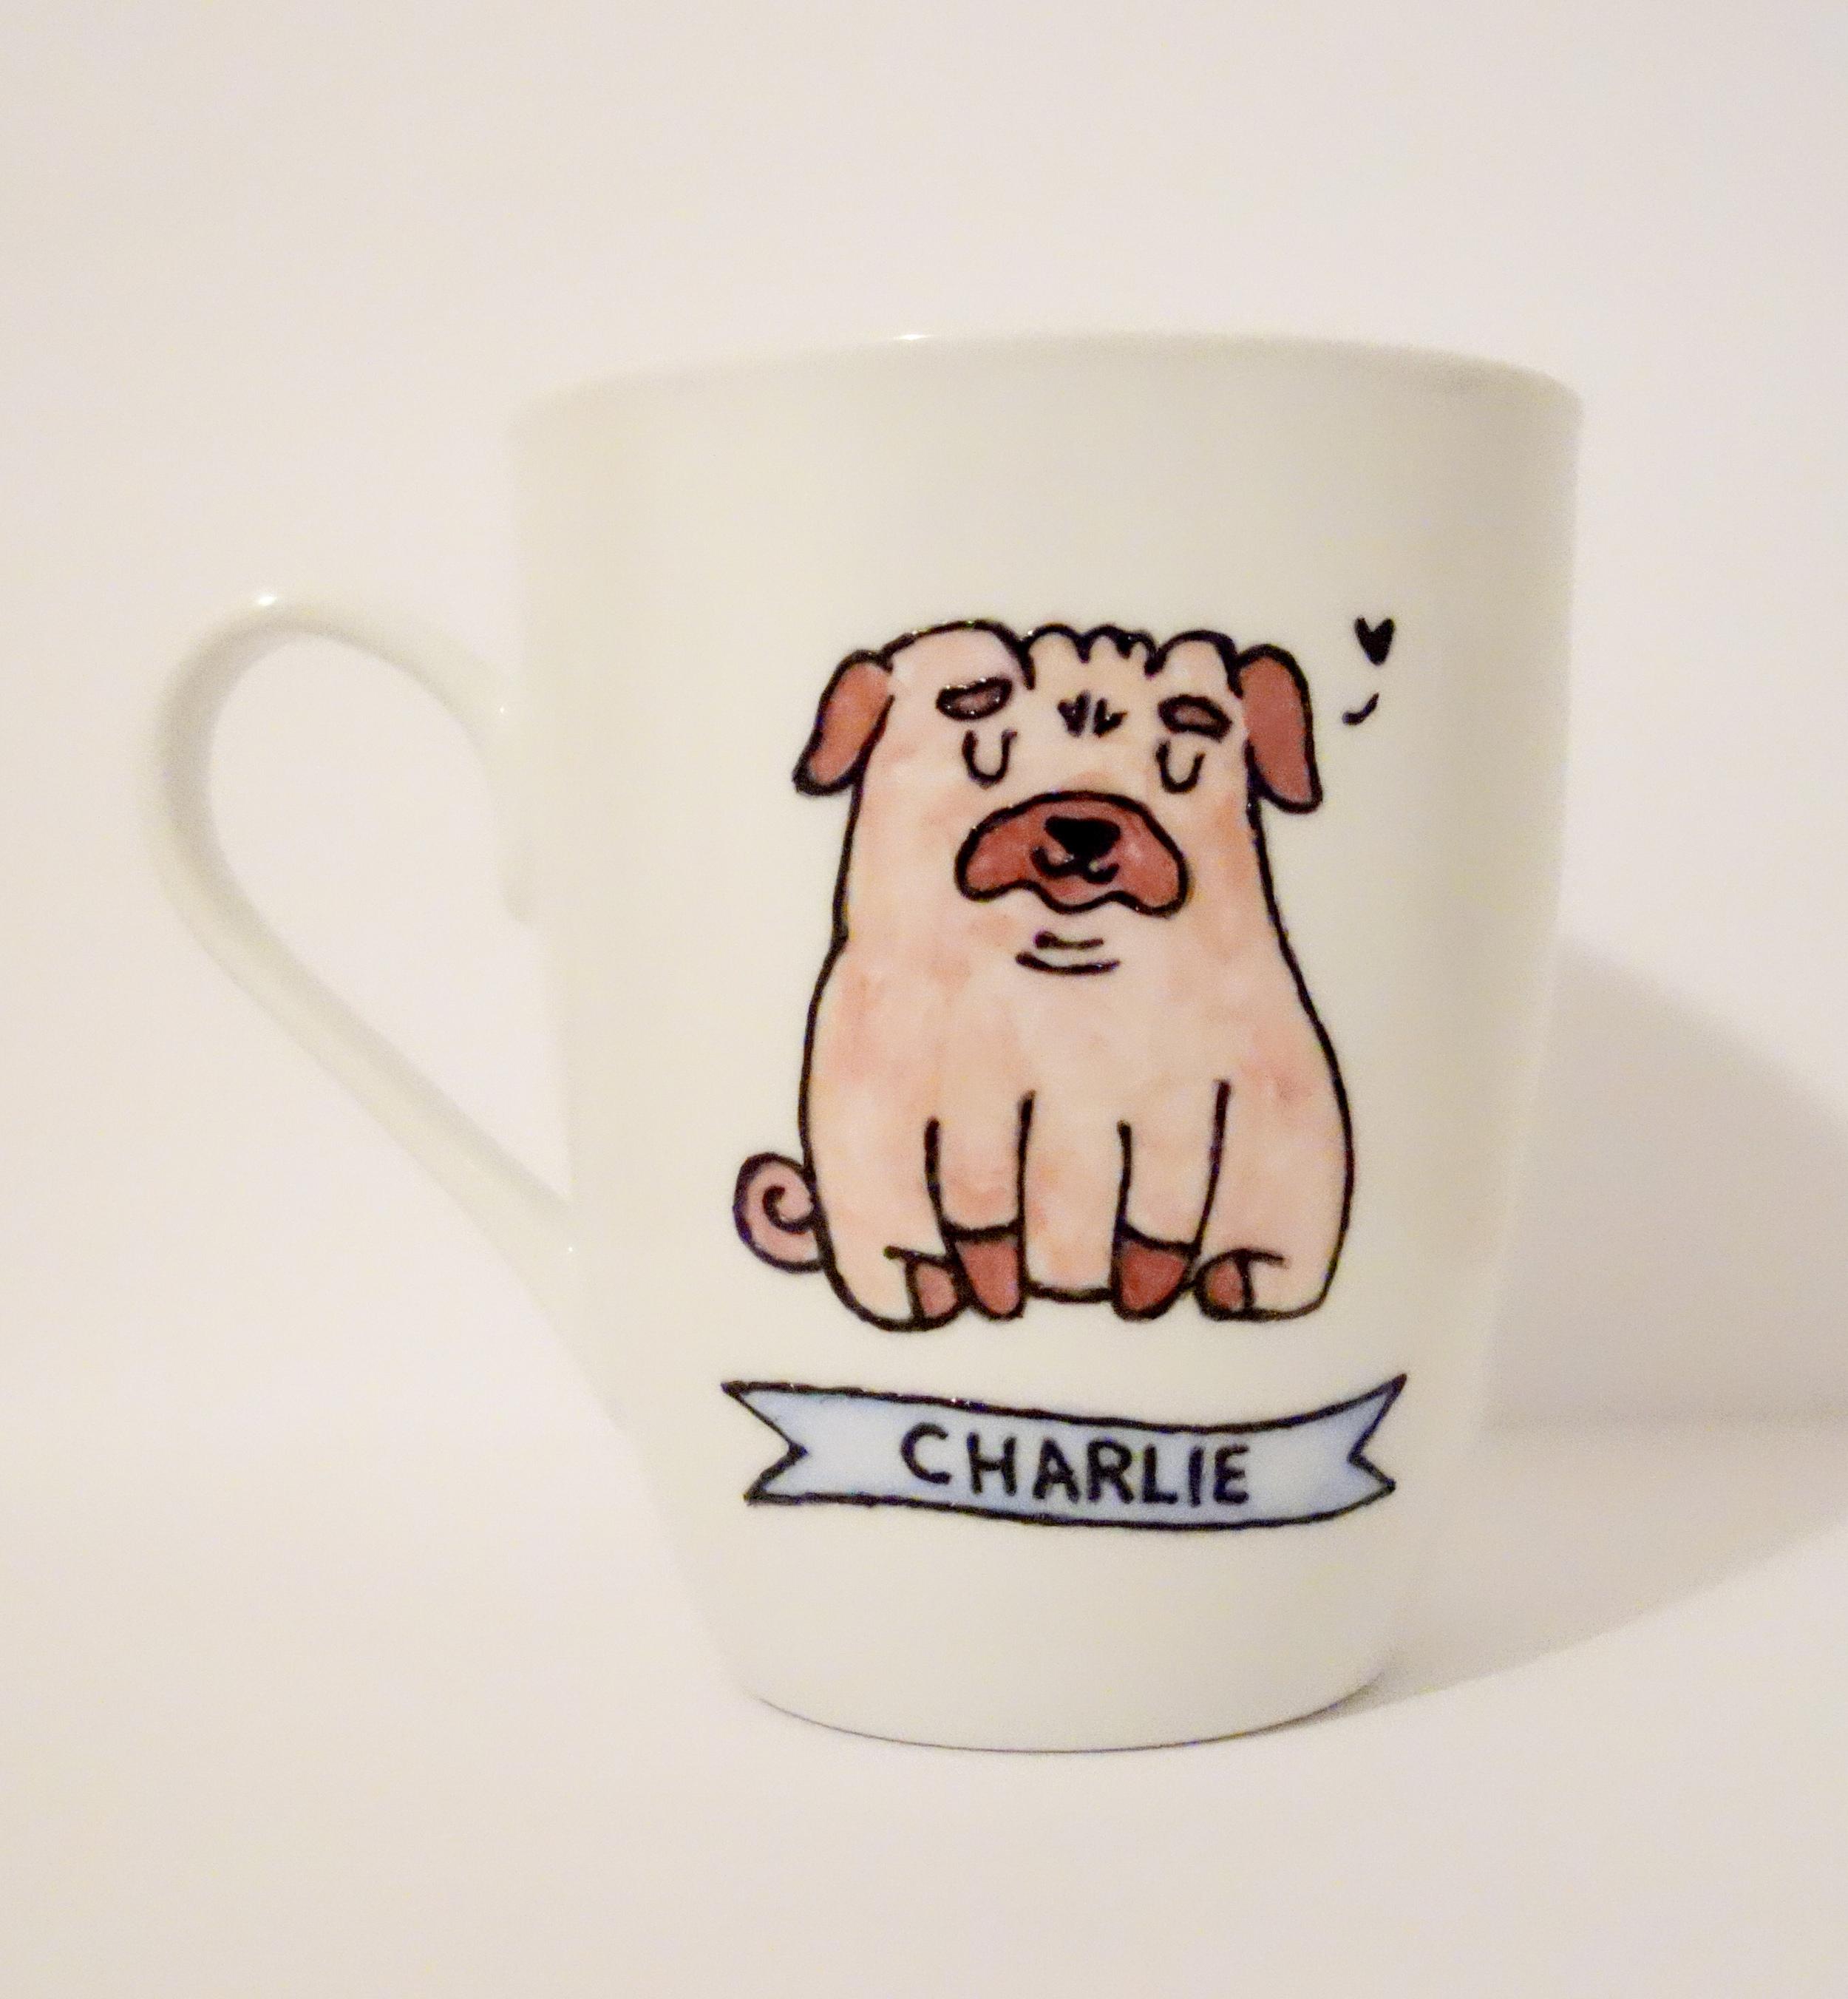 Charlie1-5.jpg